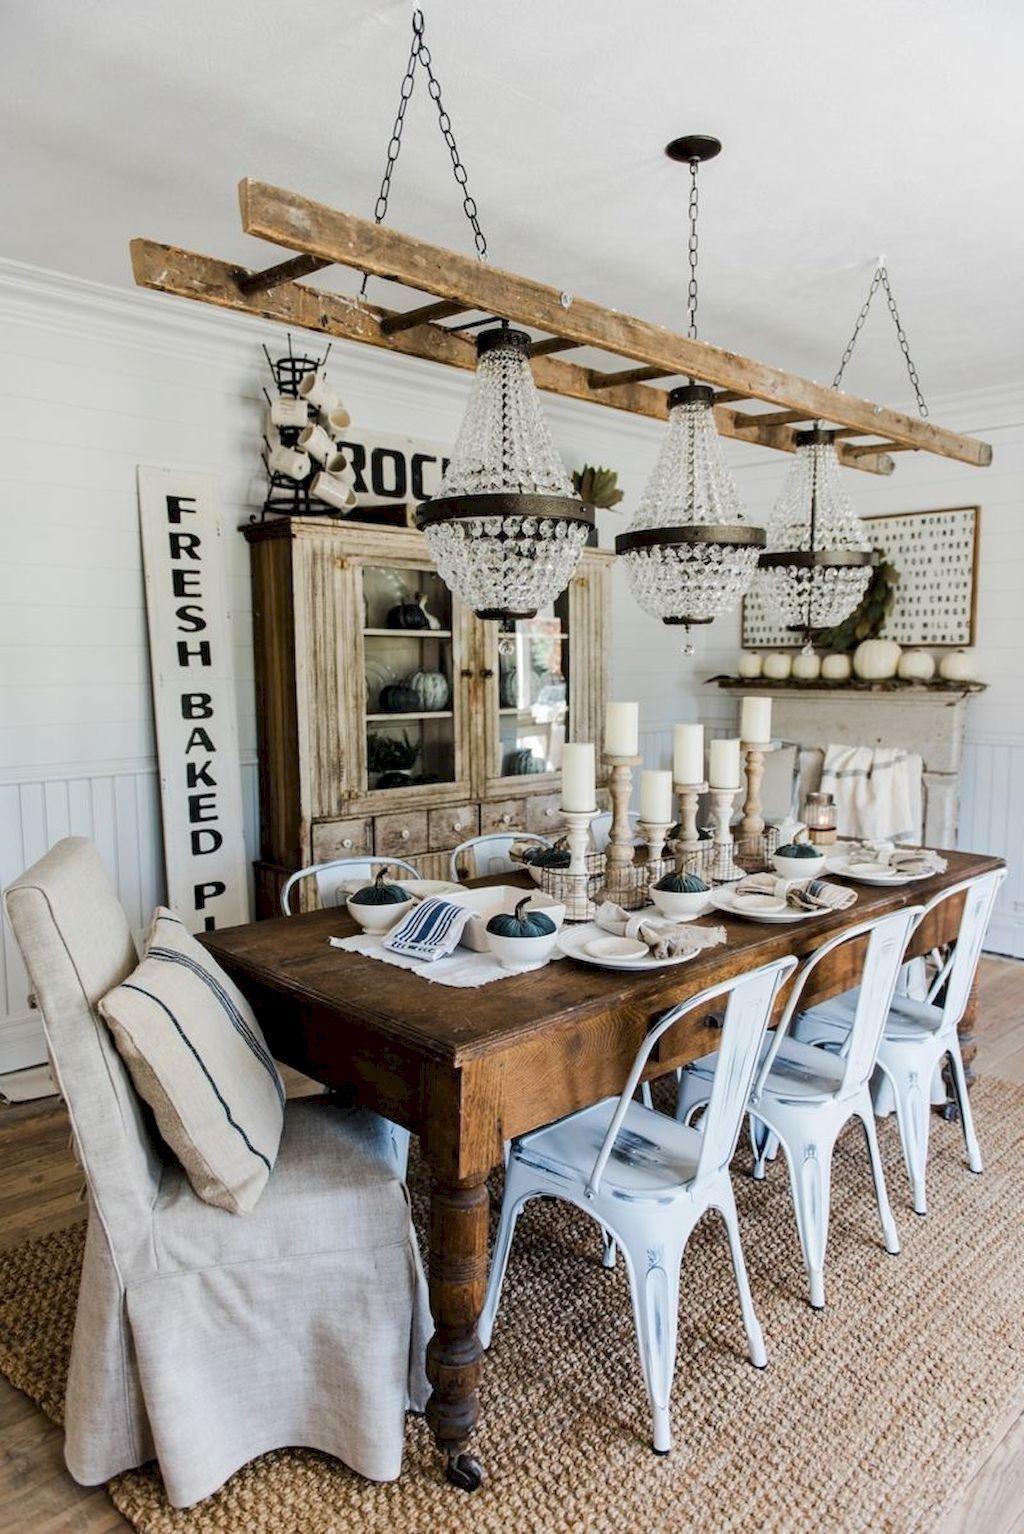 53 Awesome Modern Farmhouse Dining Room Design Ideas